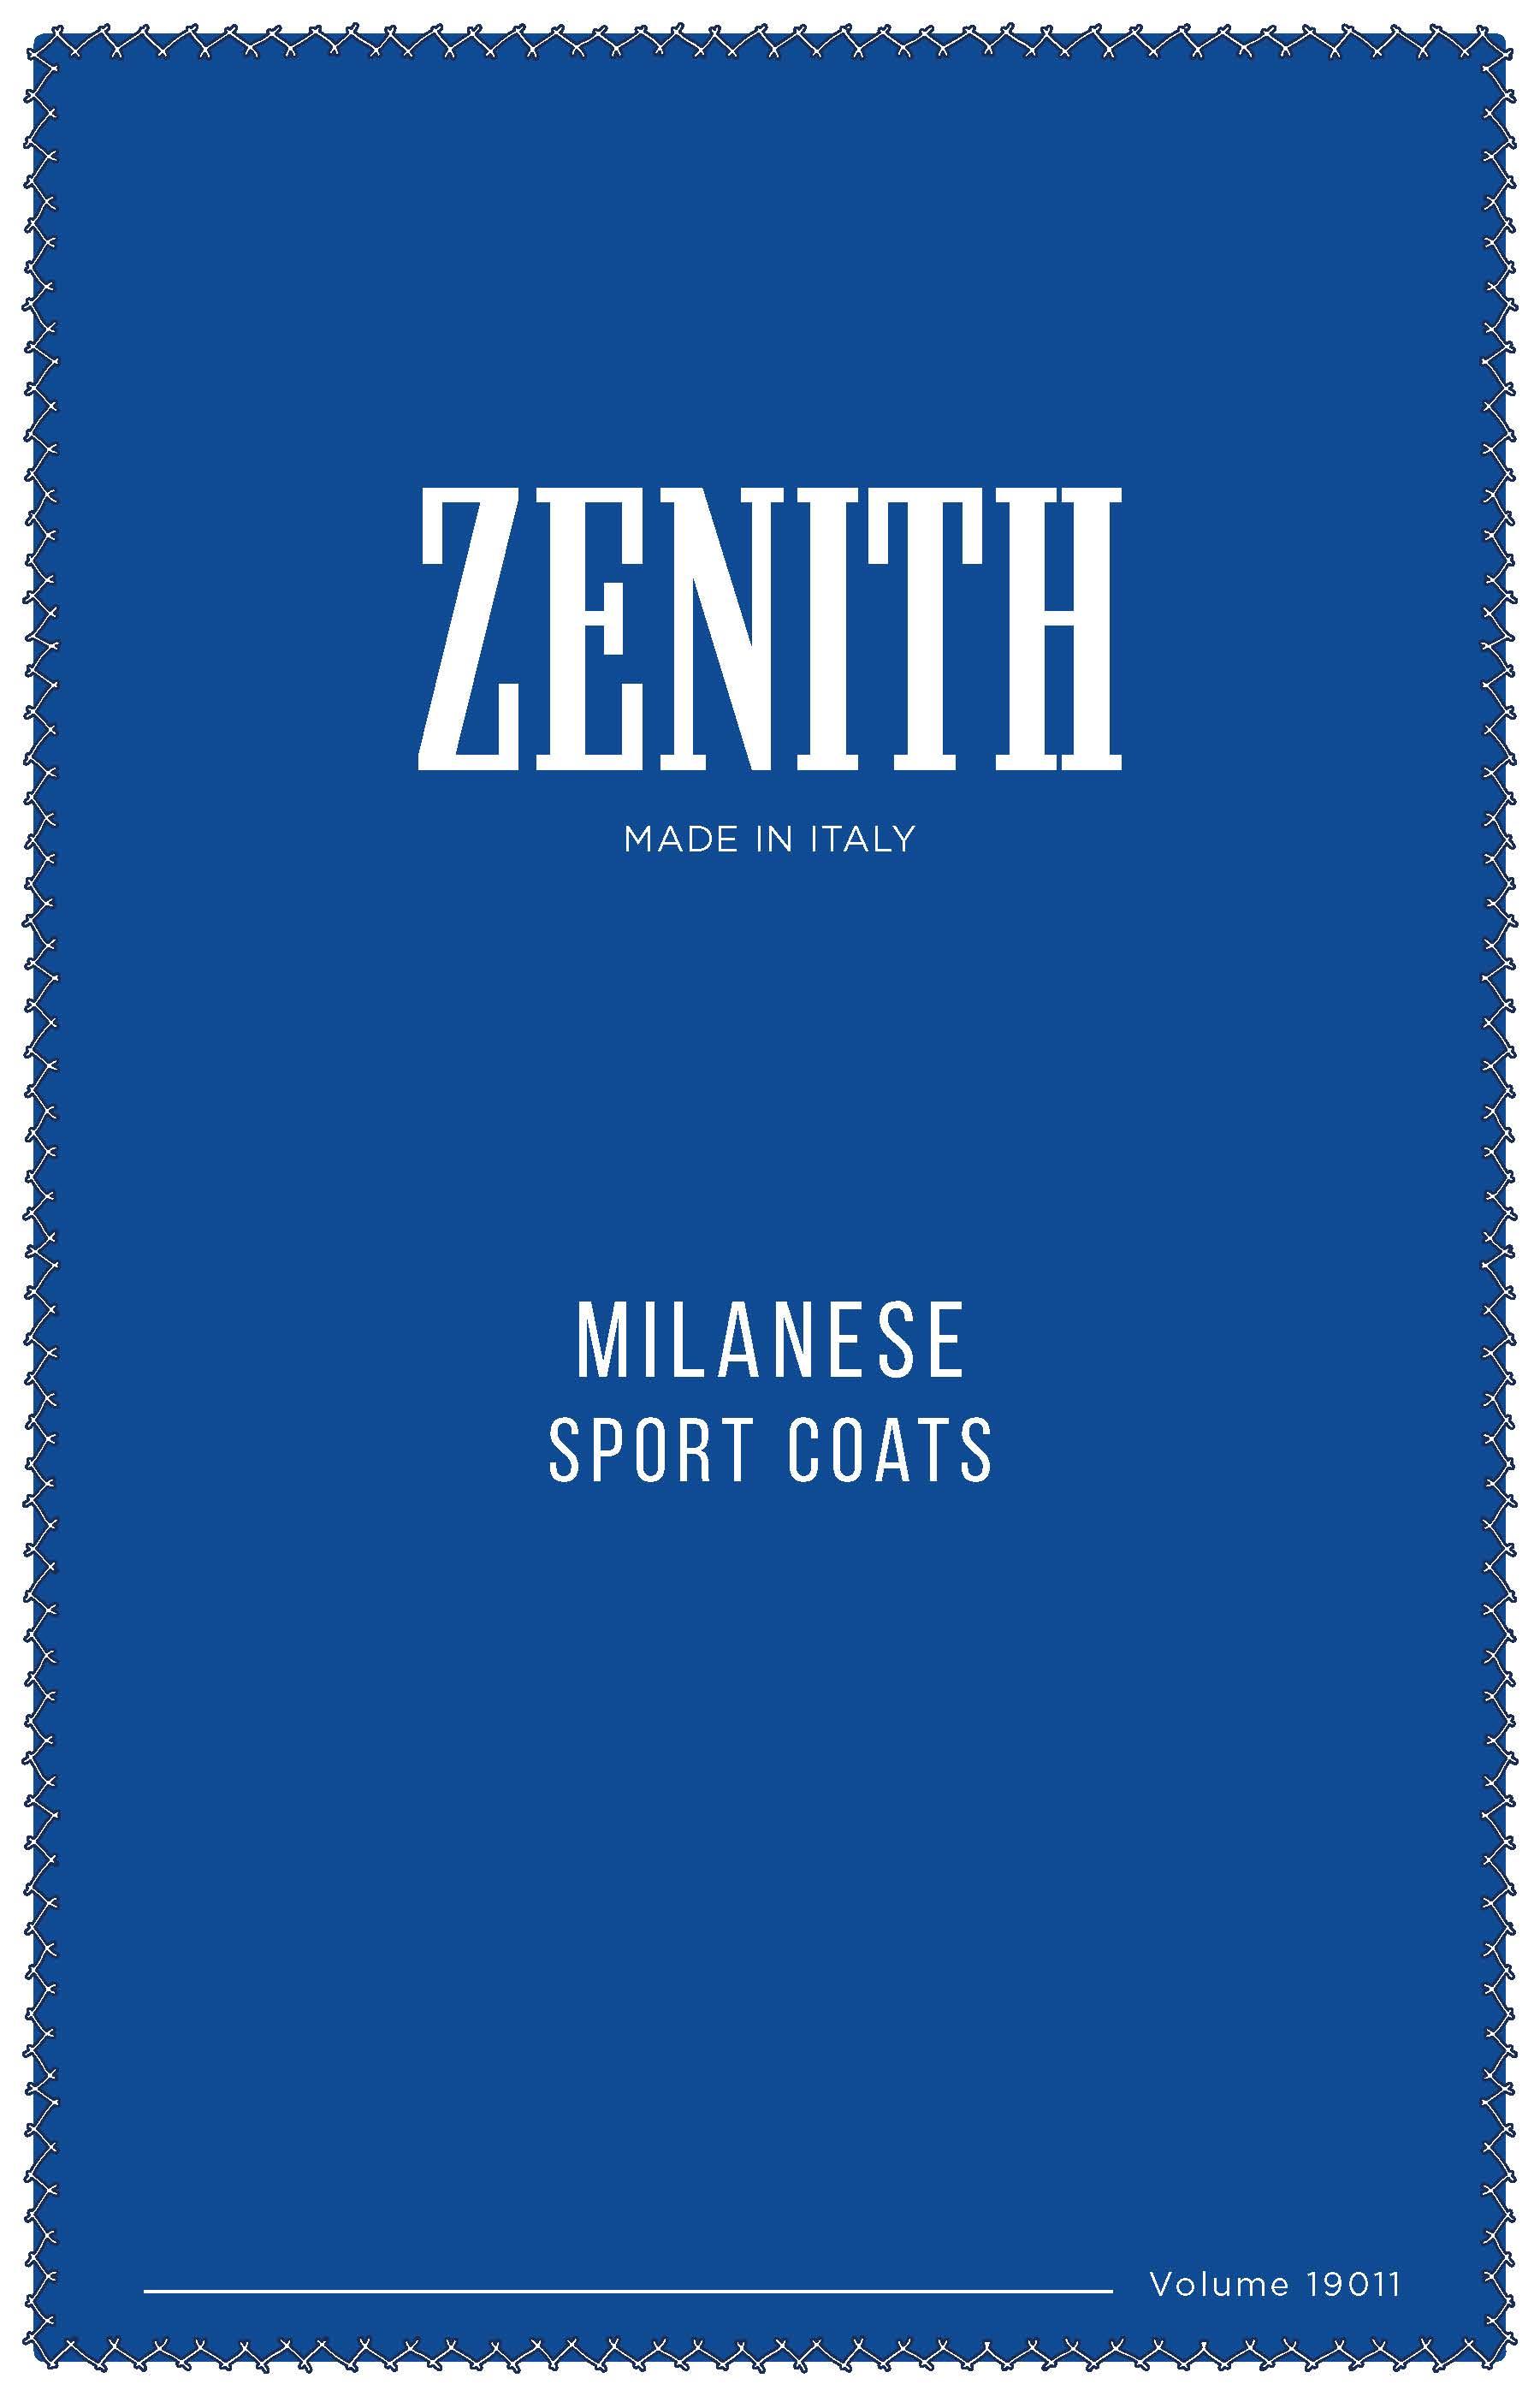 Zenith-Milanese_V19011_DIGITAL.jpg